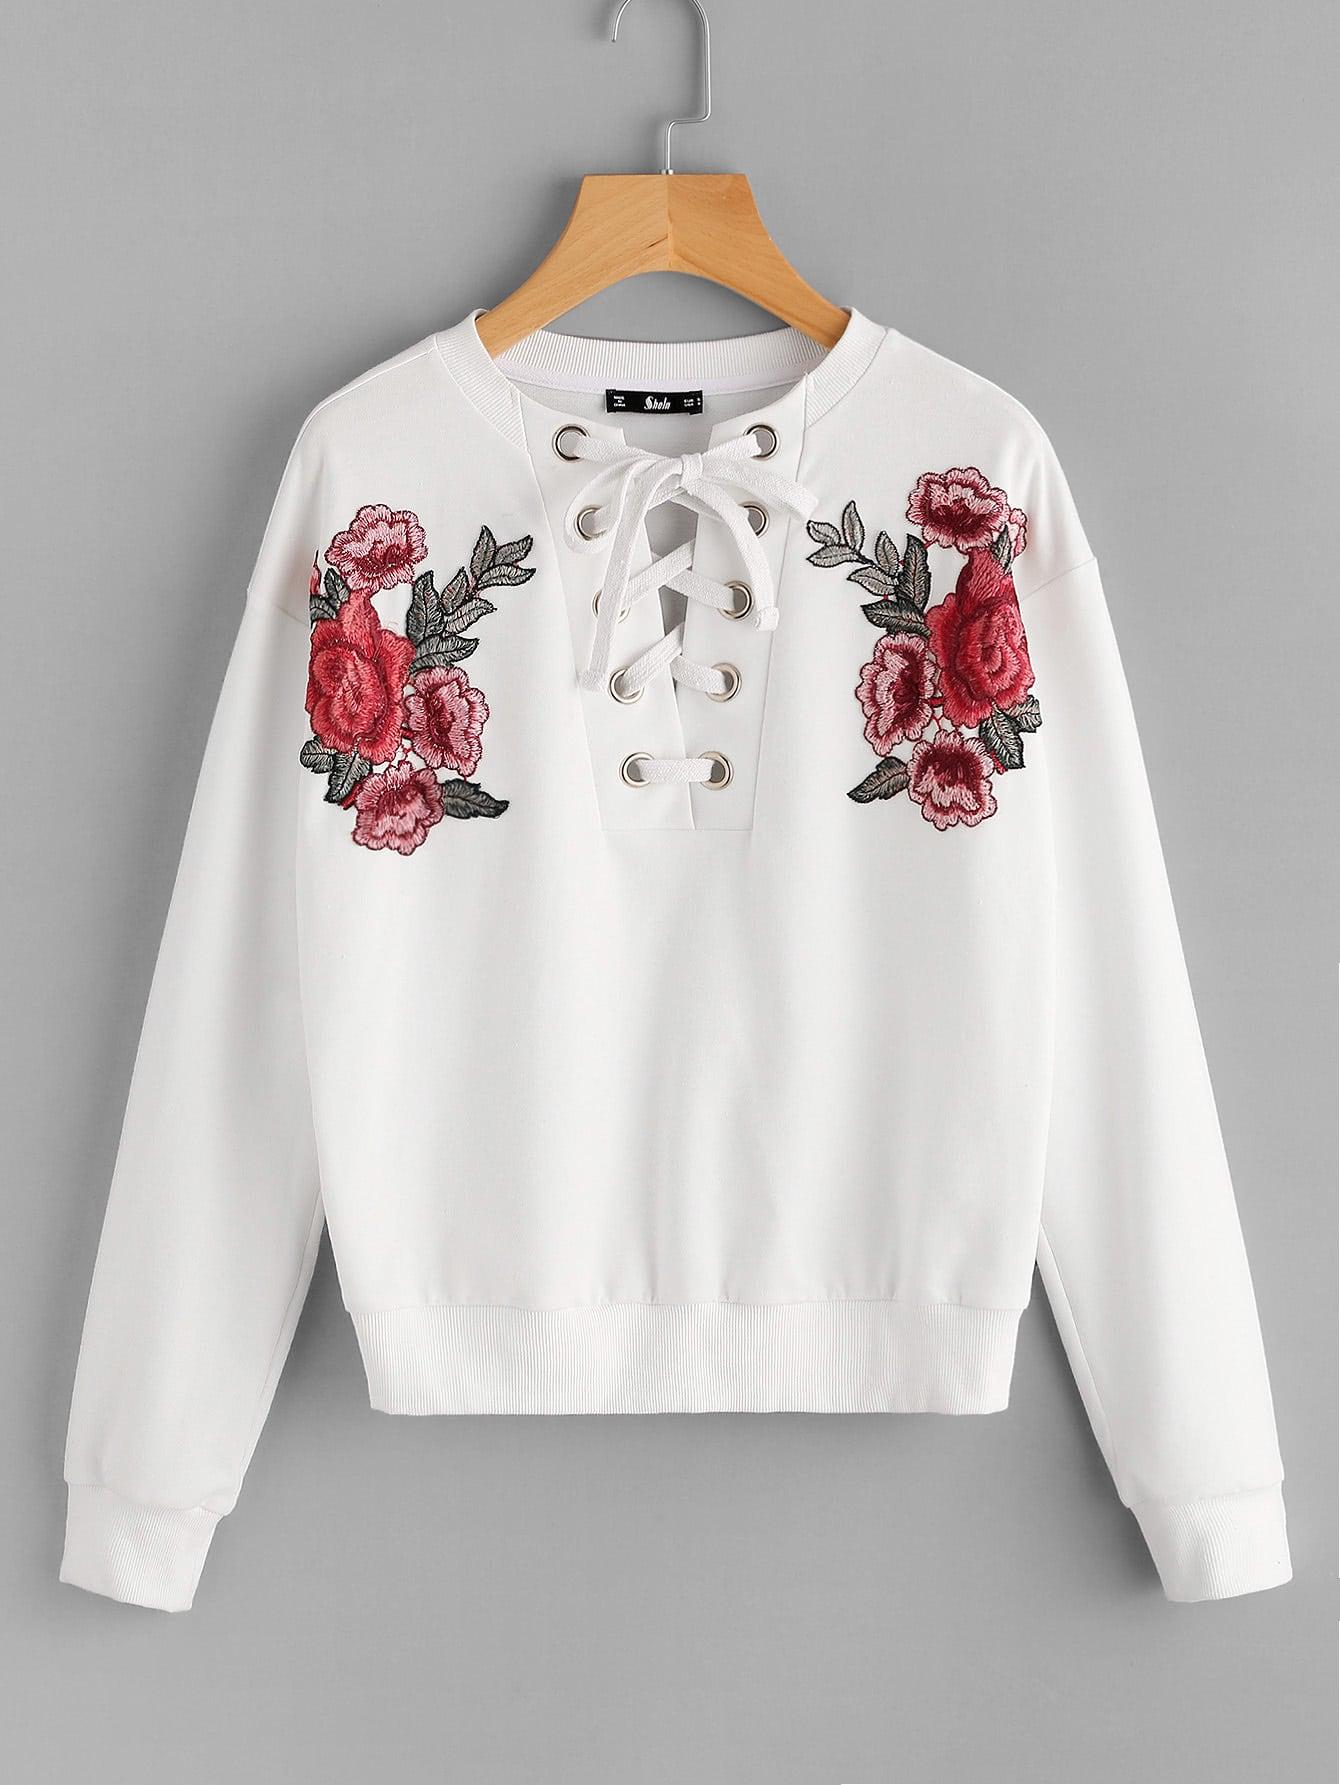 все цены на Embroidered Flower Patch Grommet Lace Up Sweatshirt